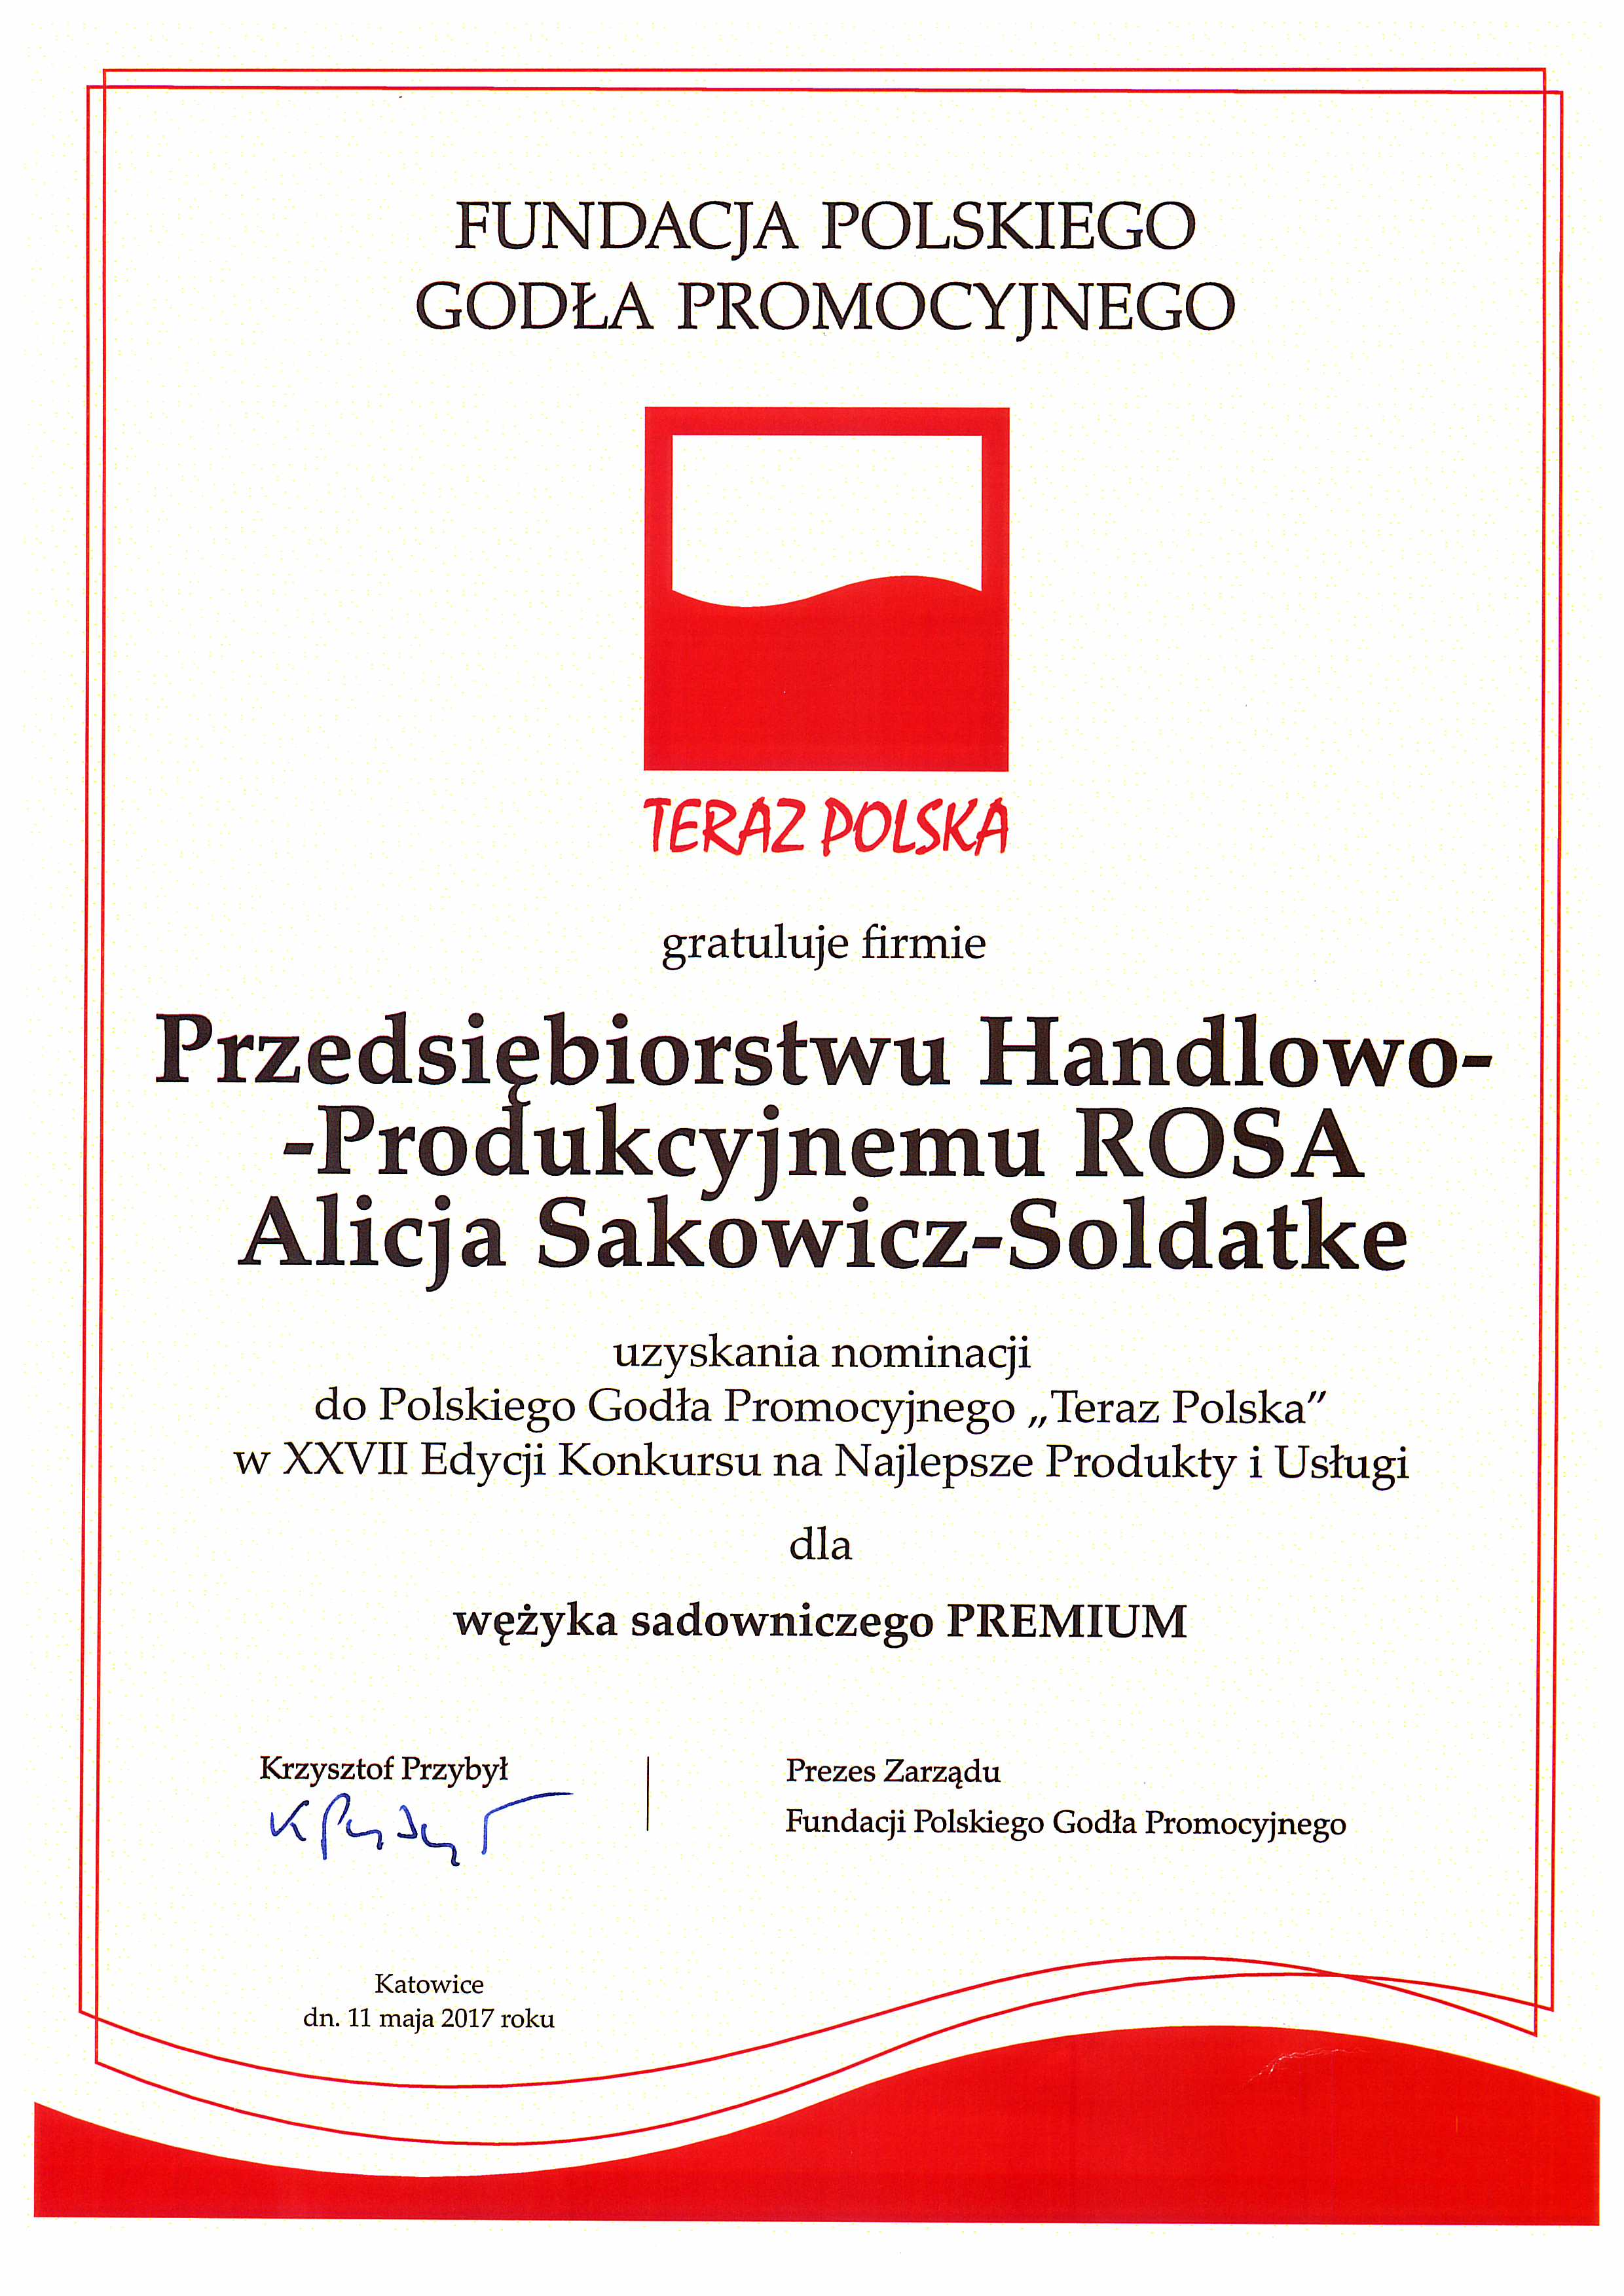 PREMIUM tubing hose NOMINATED to TERAZ POLSKA